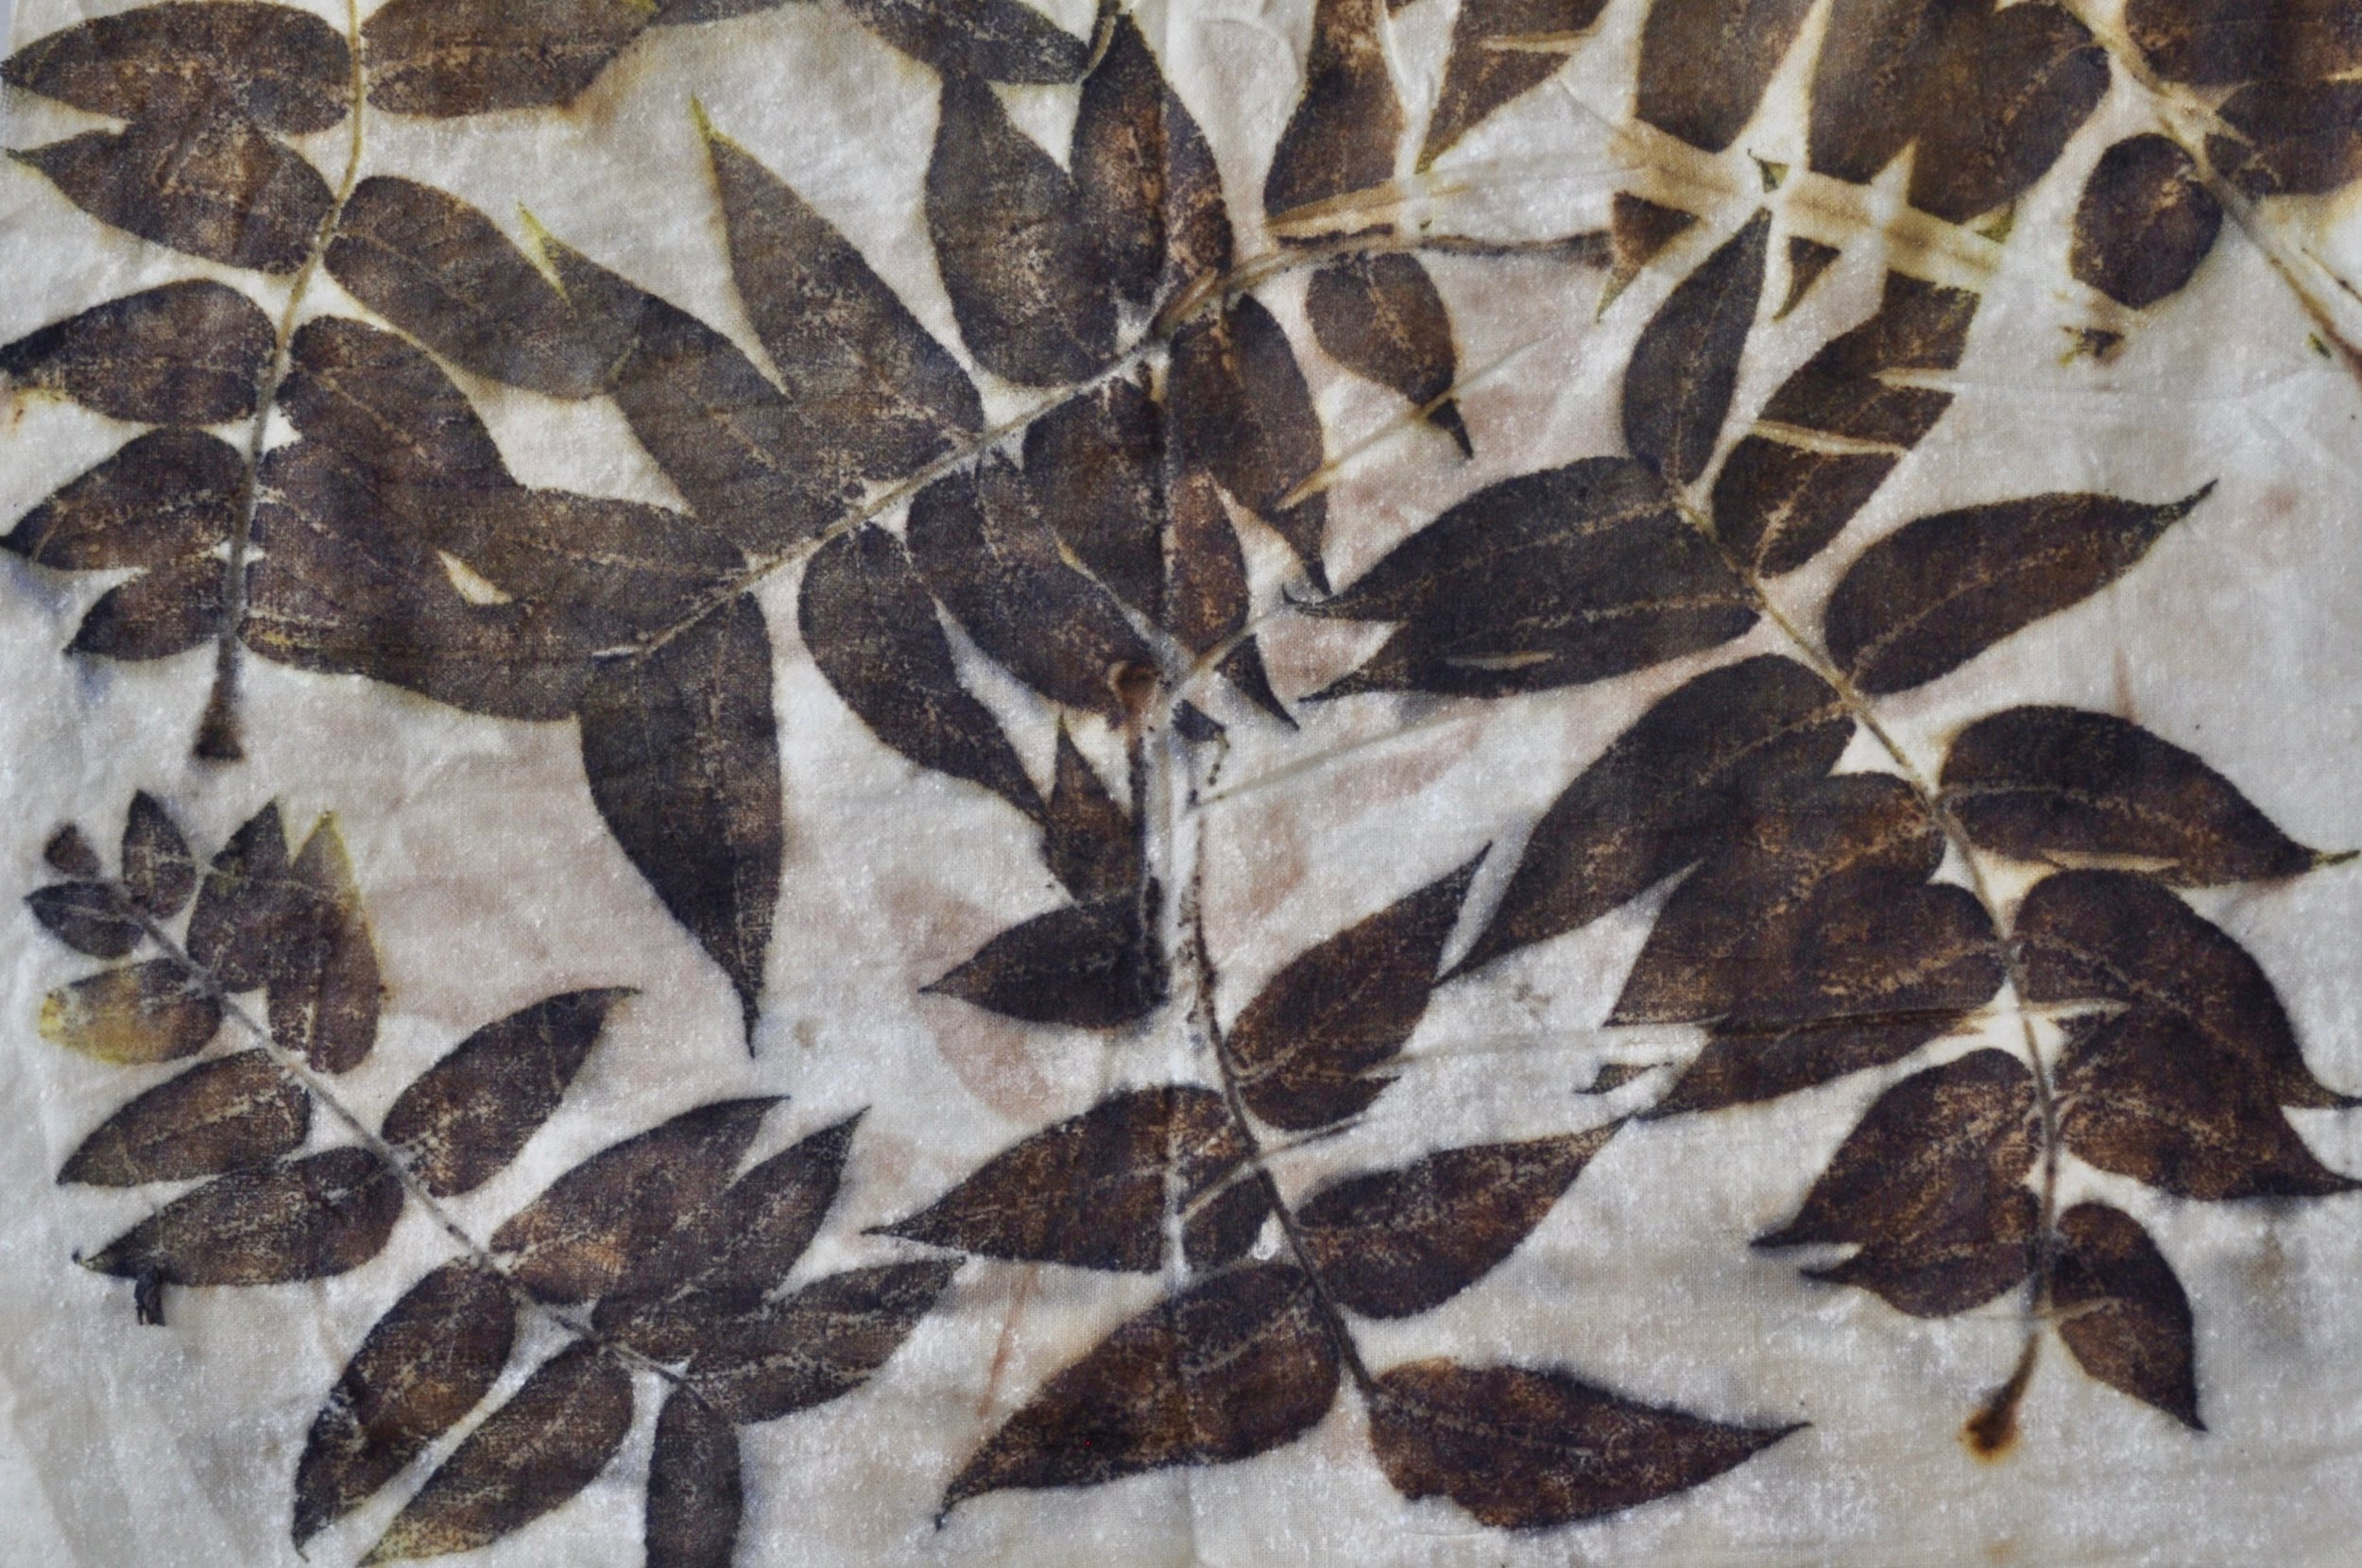 eco printing black walnut leaves